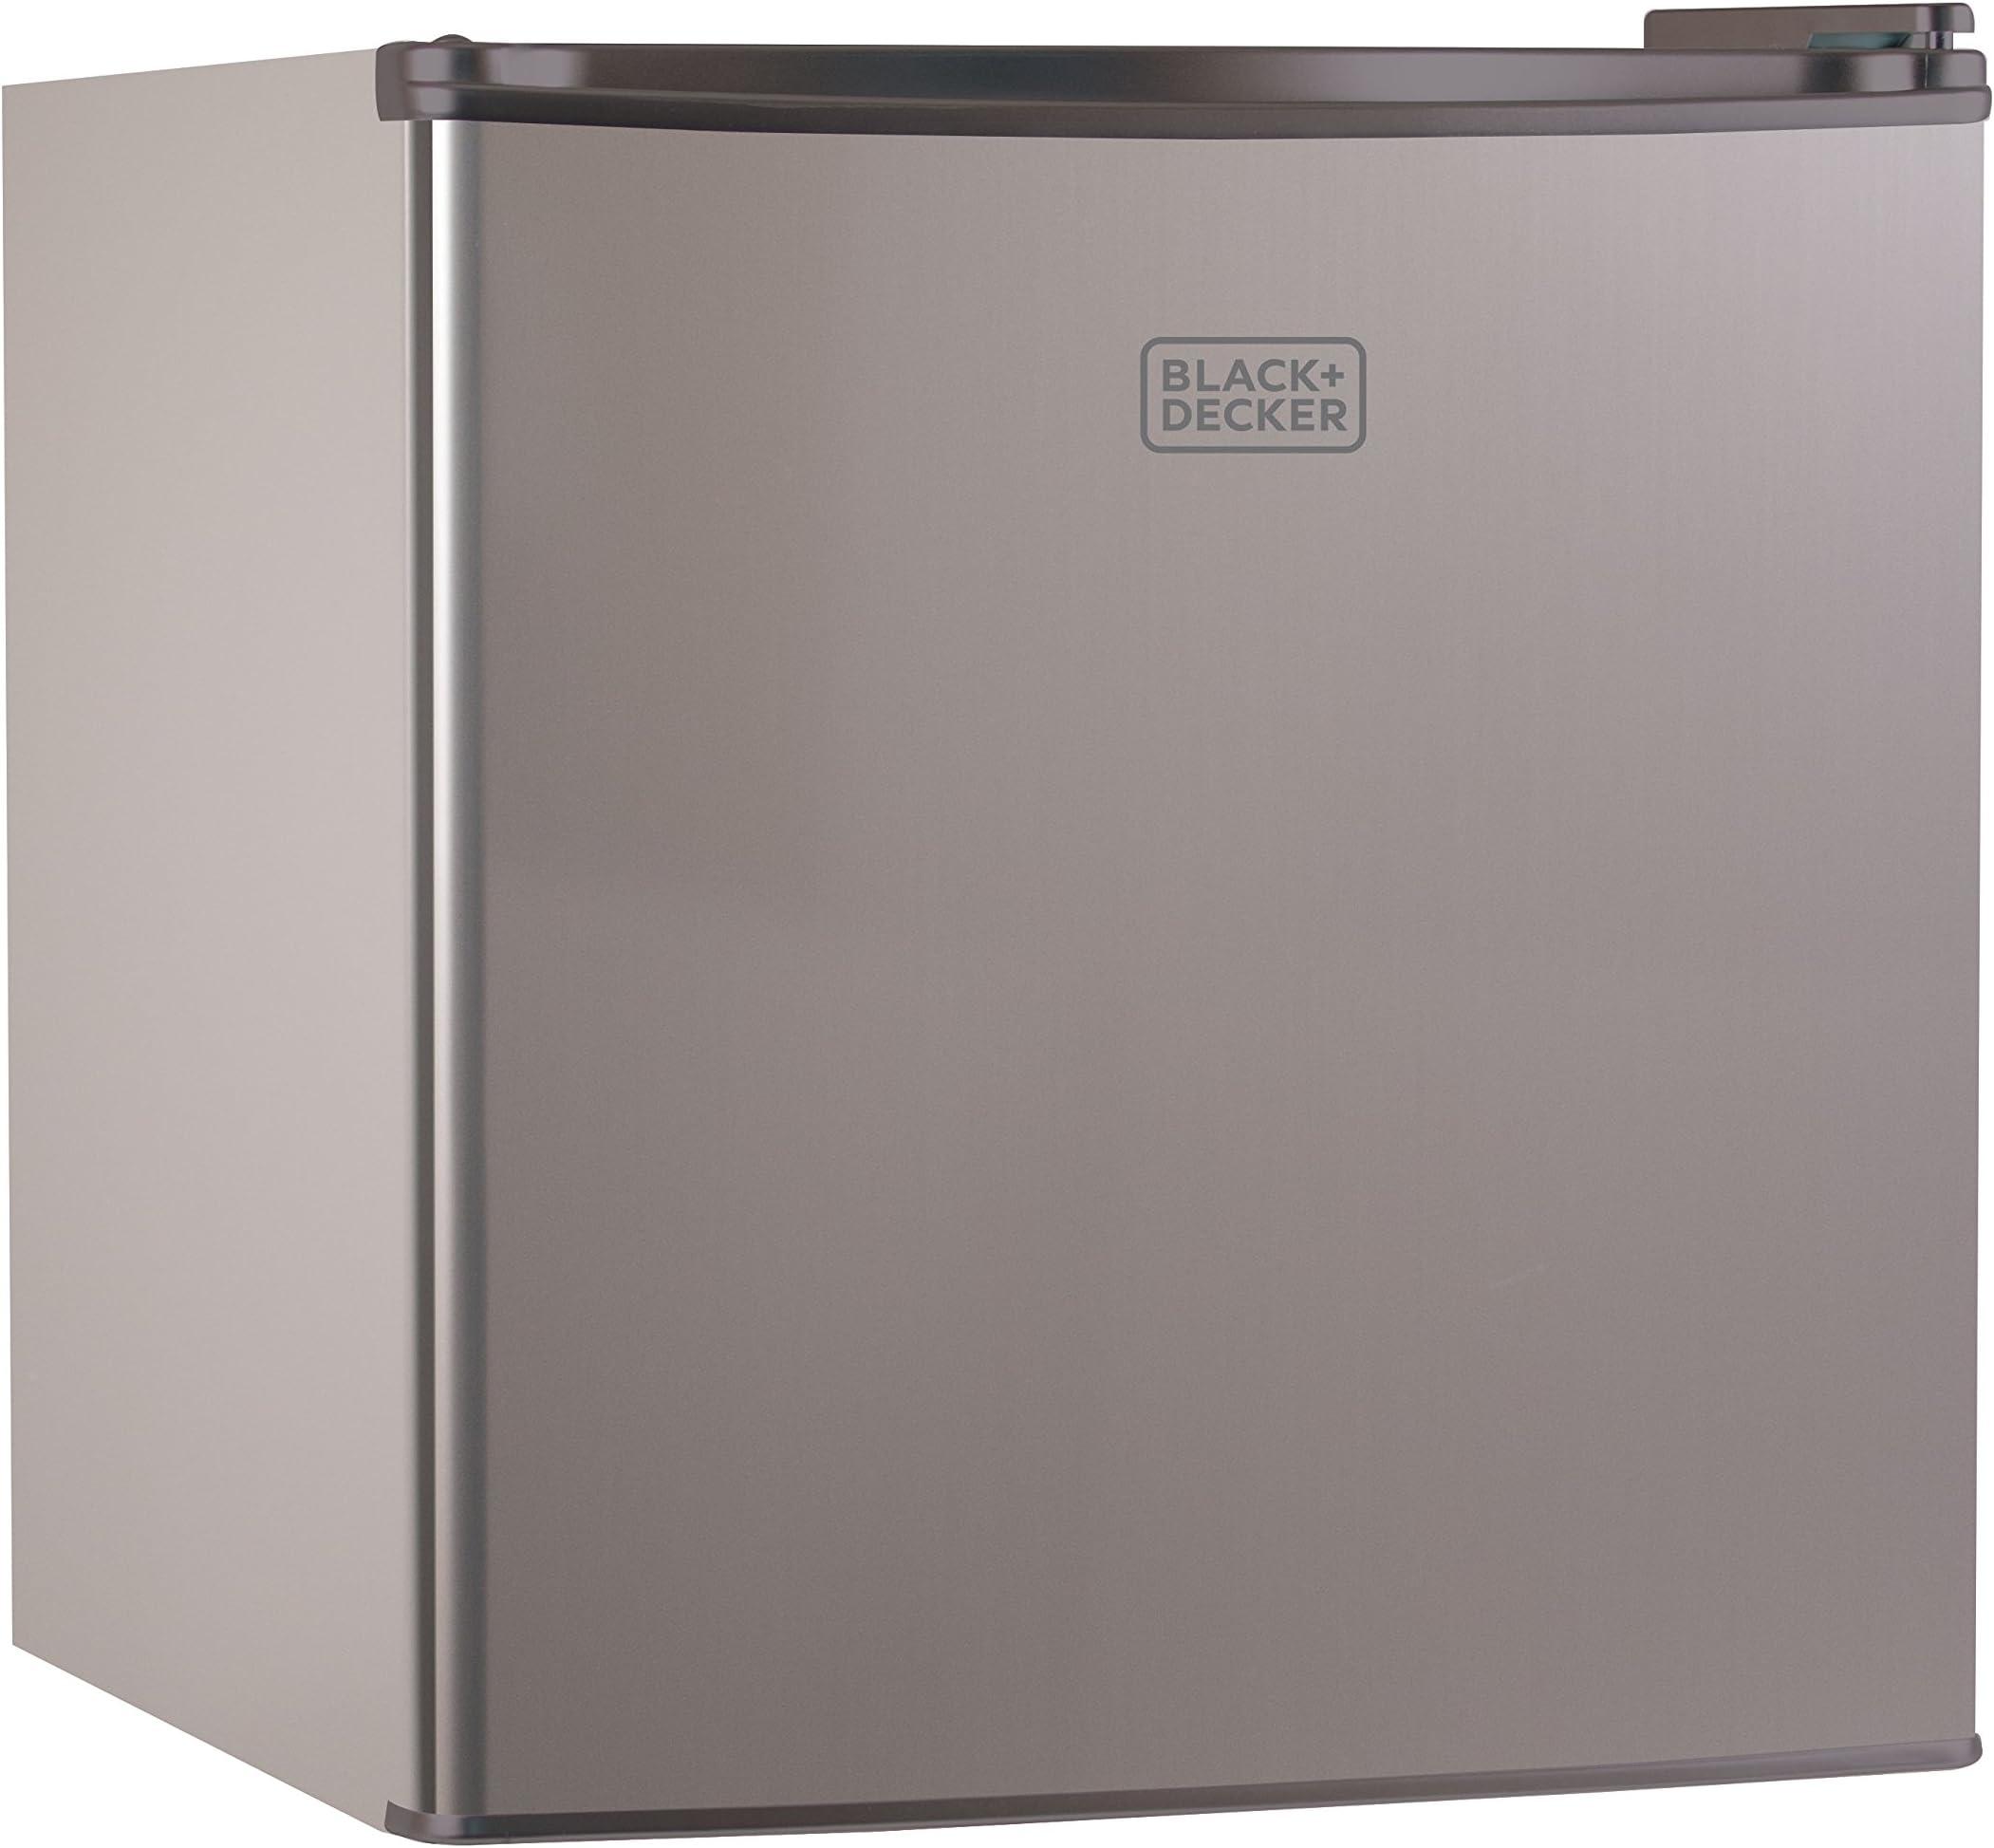 BLACK+DECKER BCRK17V Compact Refrigerator Energy Star Single Door Mini Fridge with Freezer, 1.7 Cubic Ft., VCM